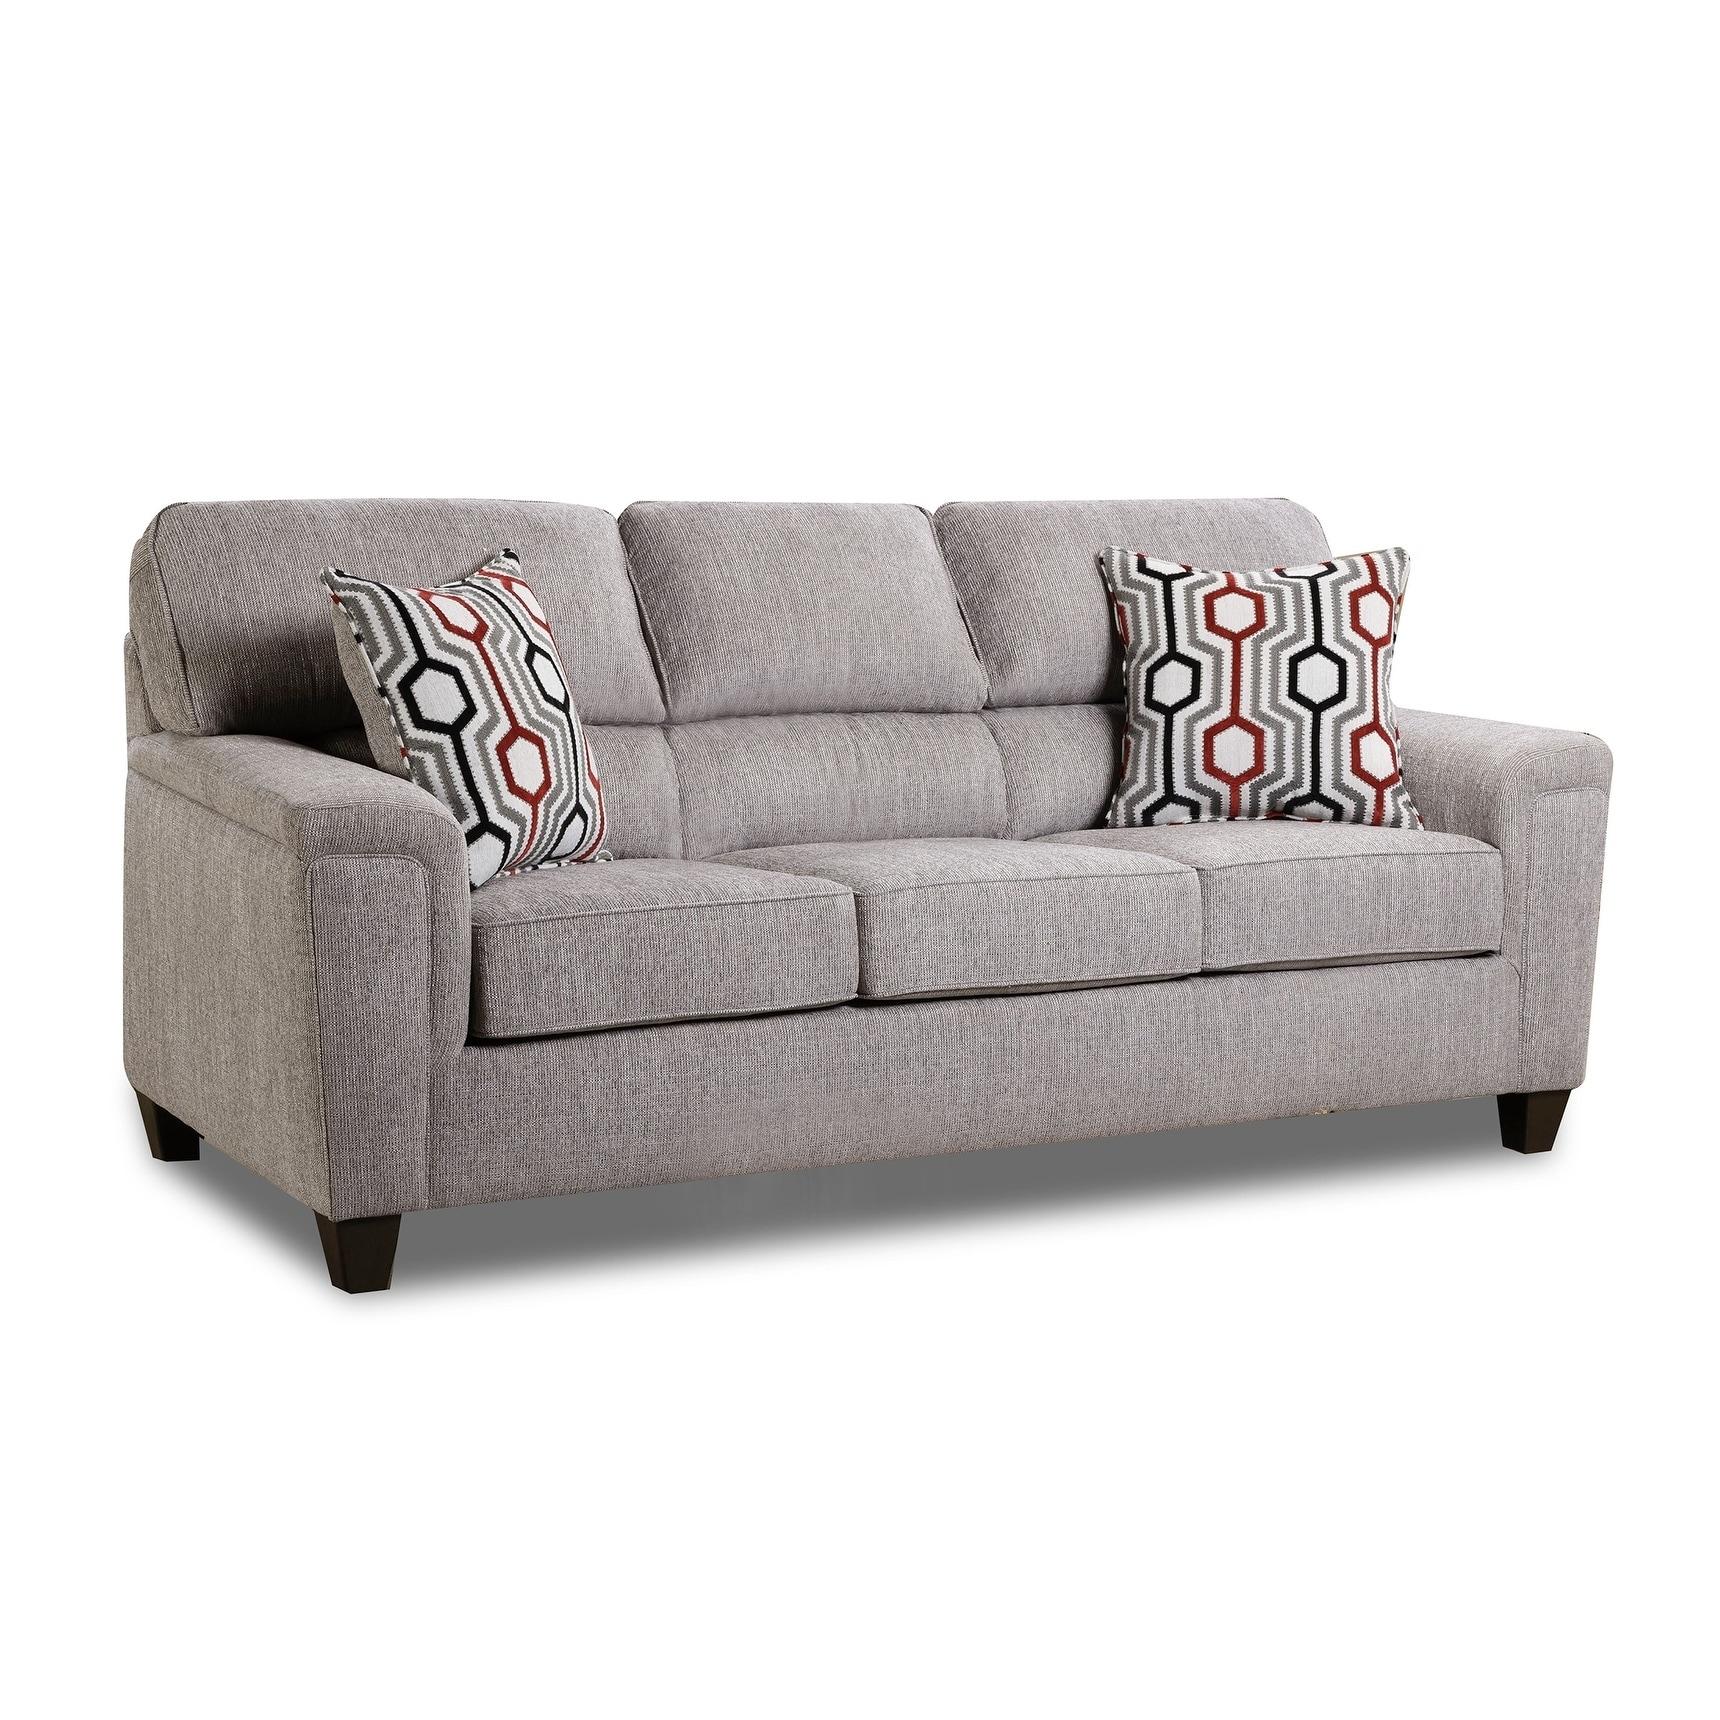 - Shop Koy Fabric Queen Sofa Sleeper With Toss Pillows - On Sale